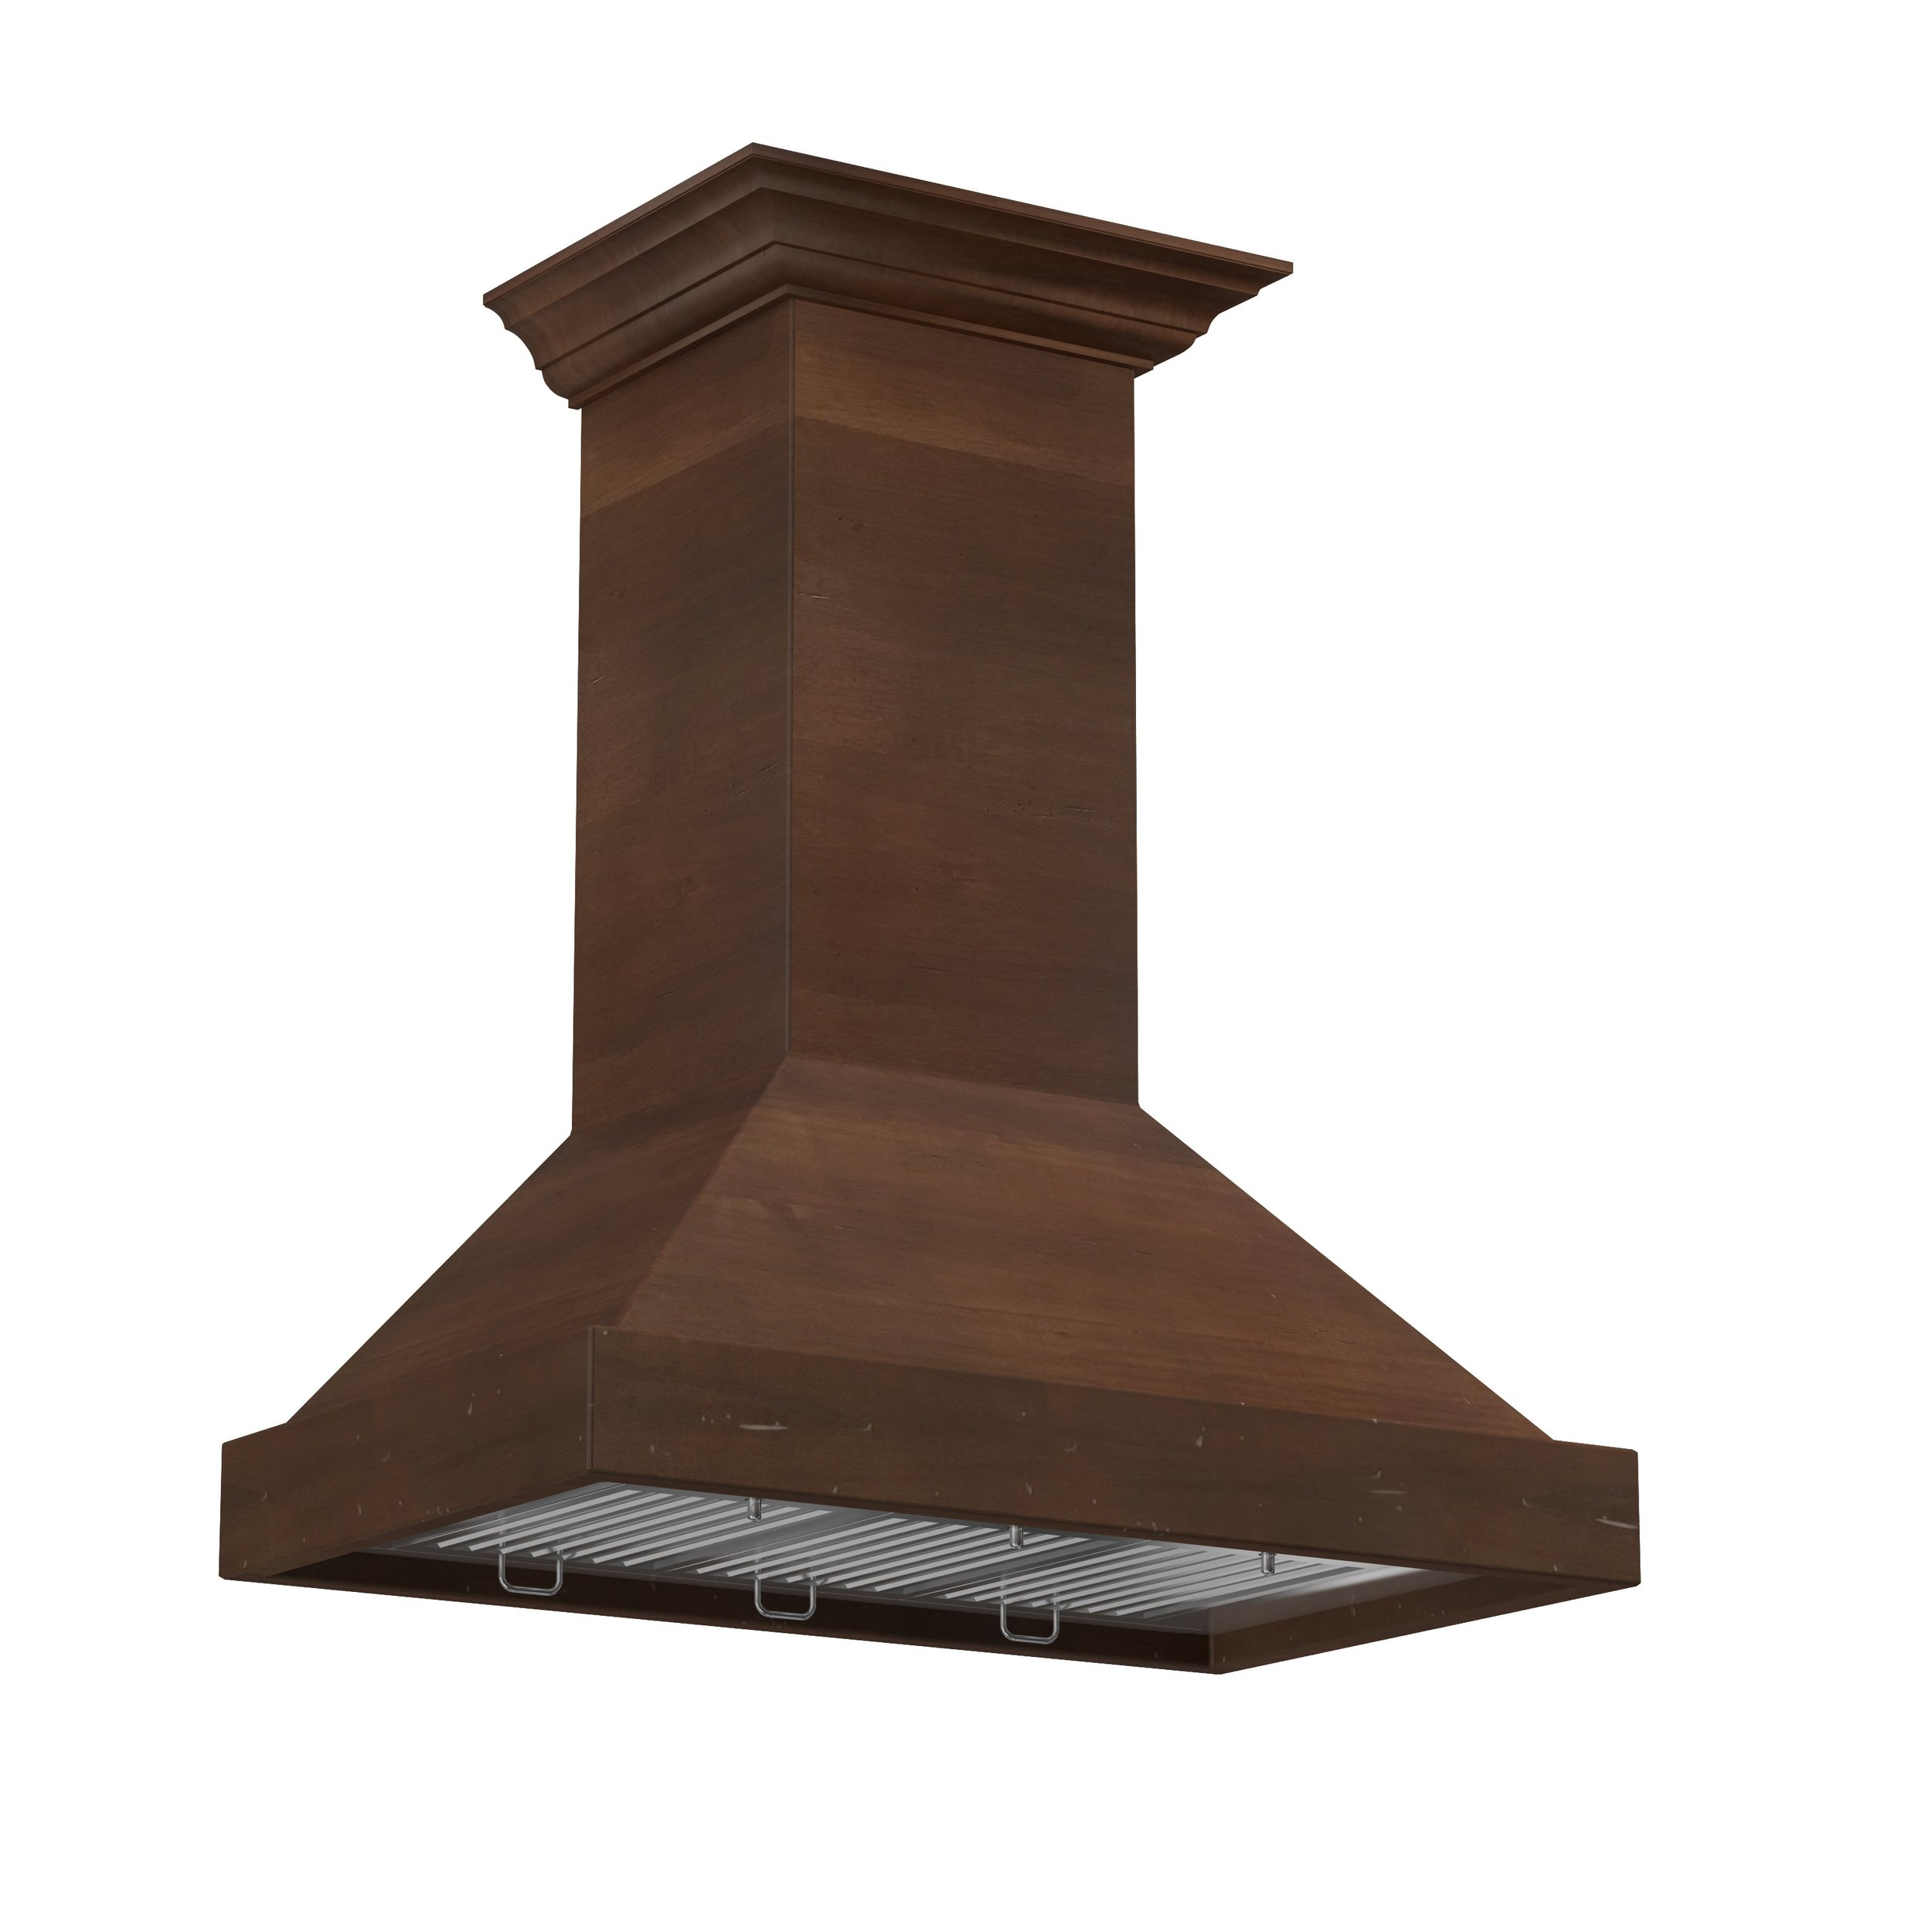 zline-designer-wood-range-hood-KBRR-side.jpg